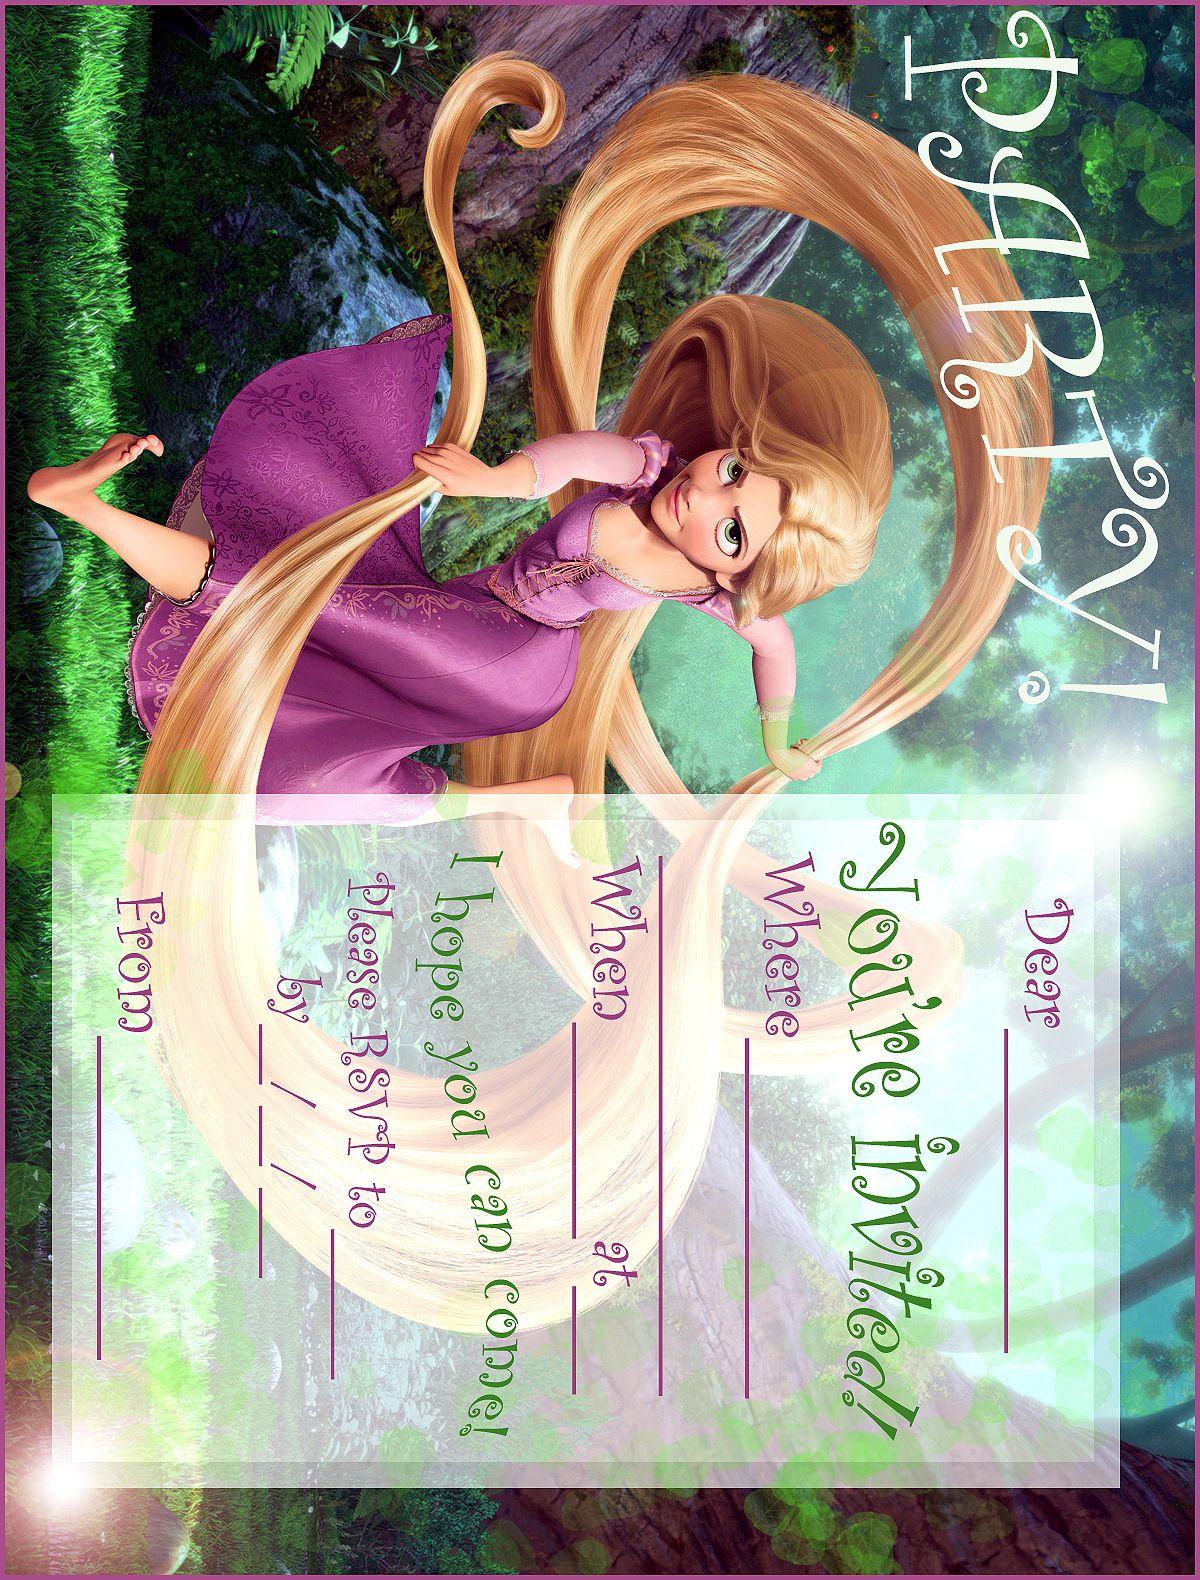 Free Valentines Cards To Print For Teacher Disneys Tangled Printable Party Invitation Imprimir Gratis Jpg